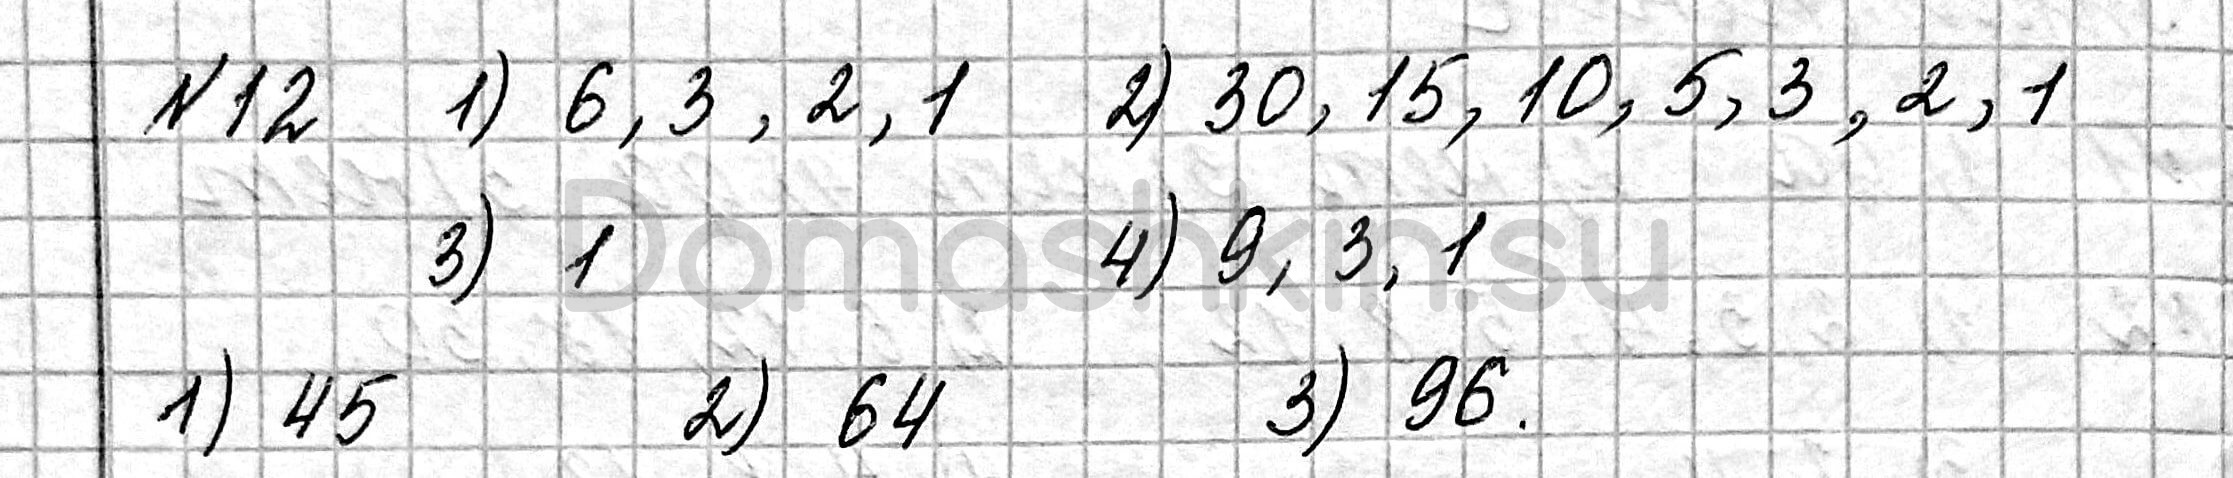 Математика 6 класс учебник Мерзляк номер 12 решение